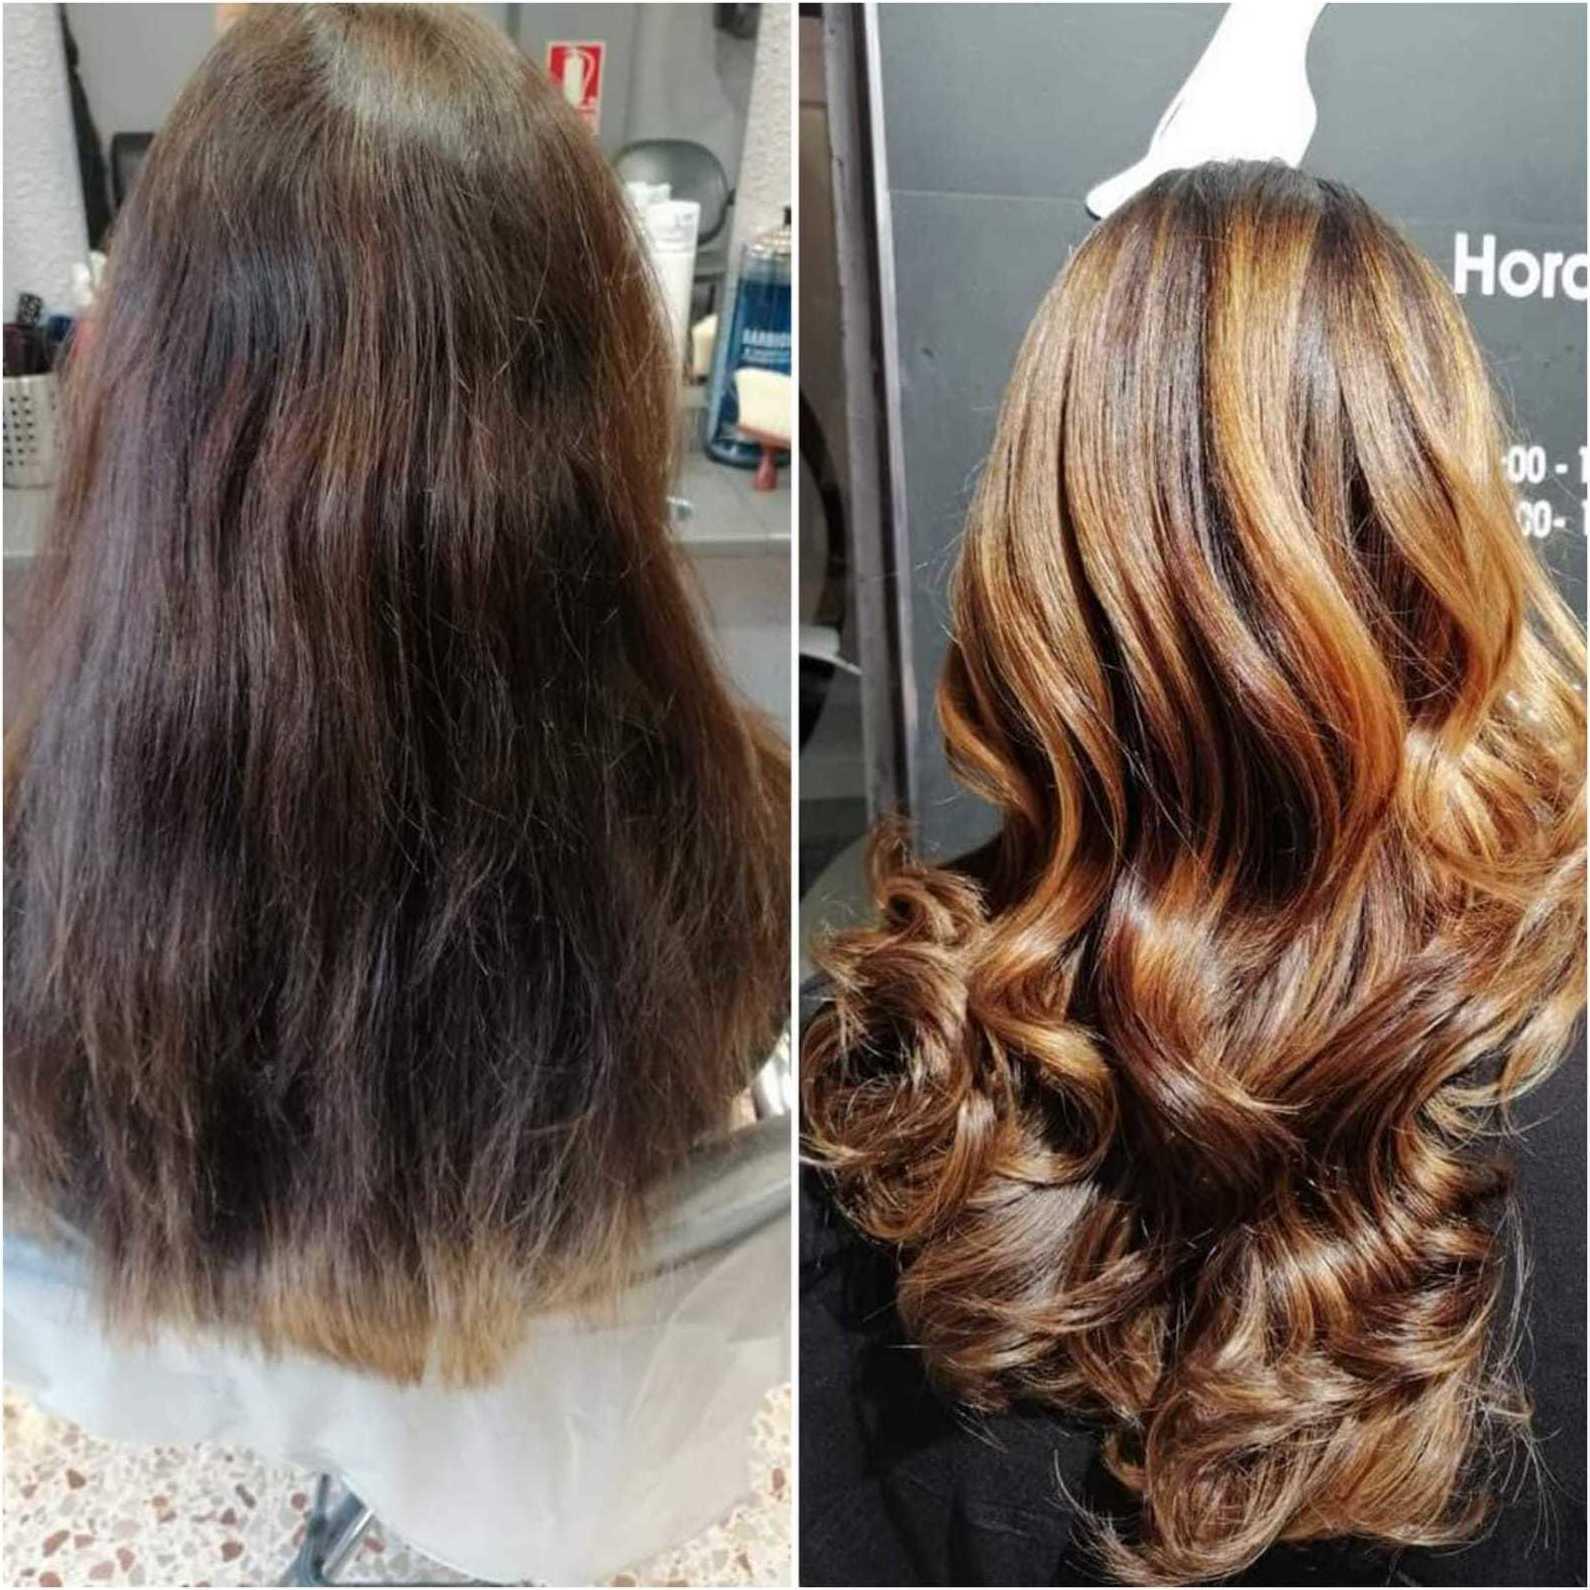 Foto 4 de Peluquería y maquillaje en  | Lucian Hair&Beauty